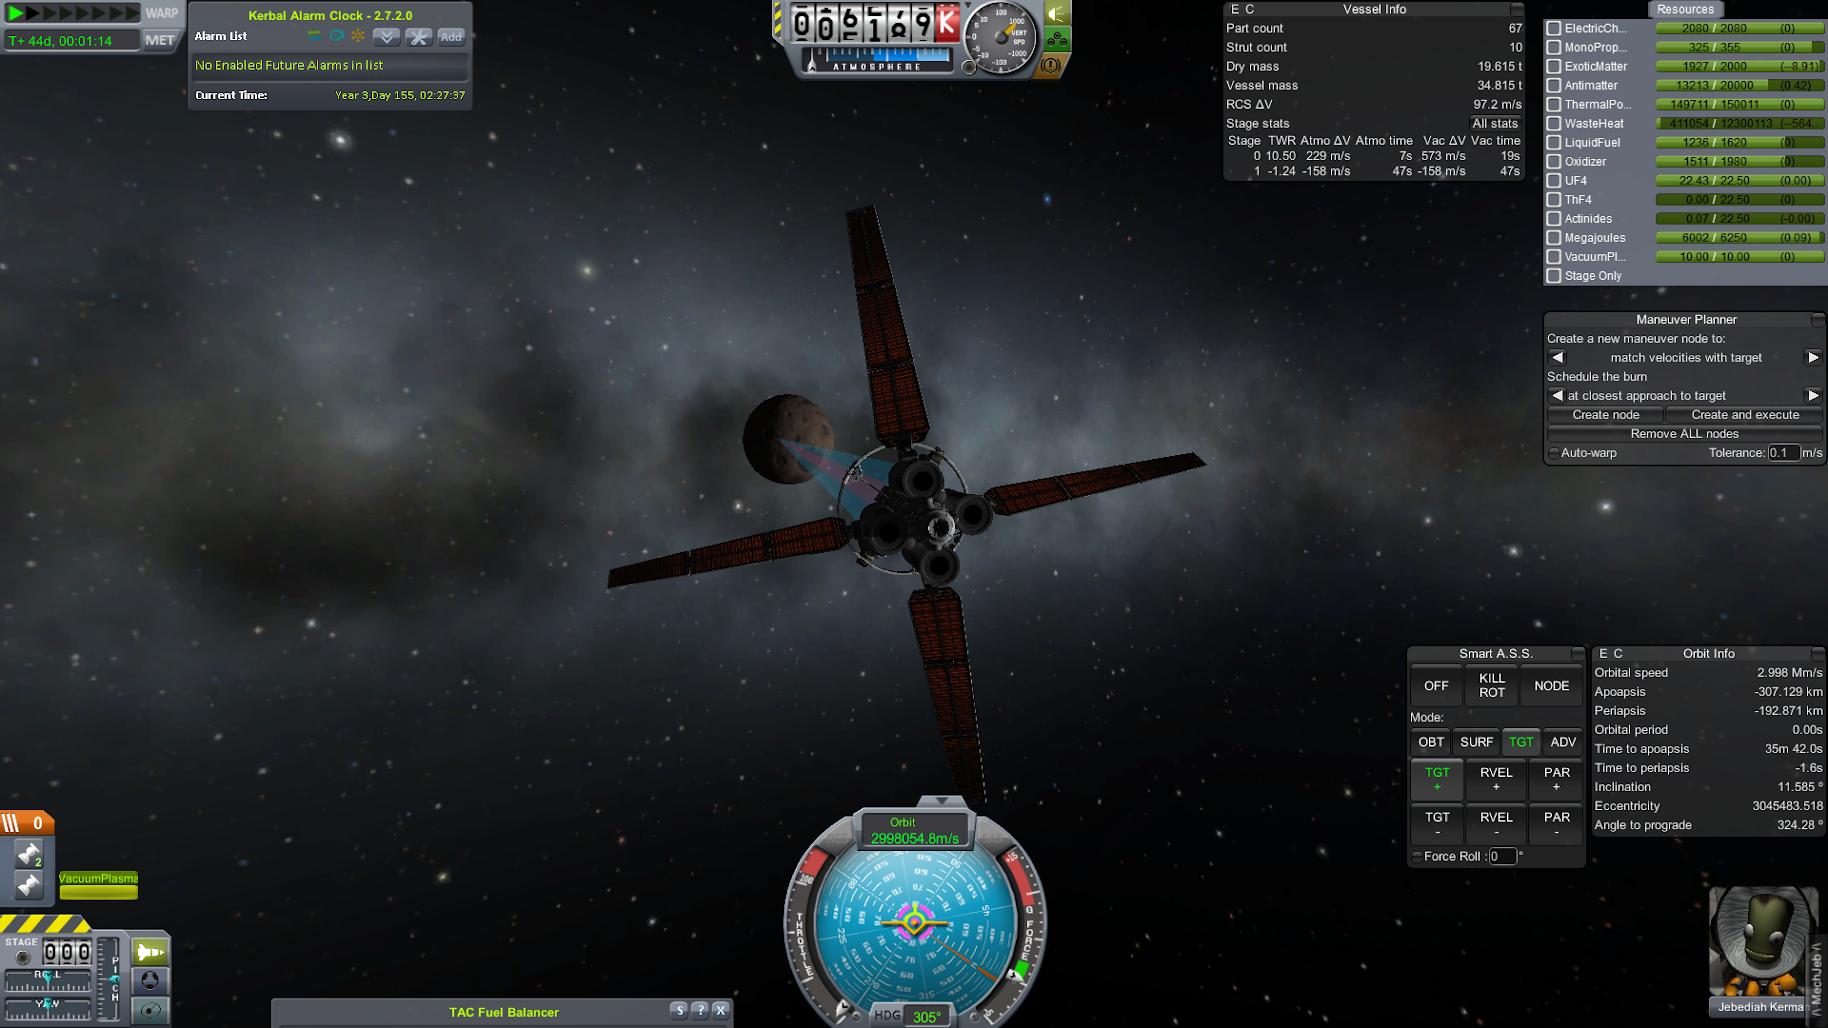 screenshot114.png